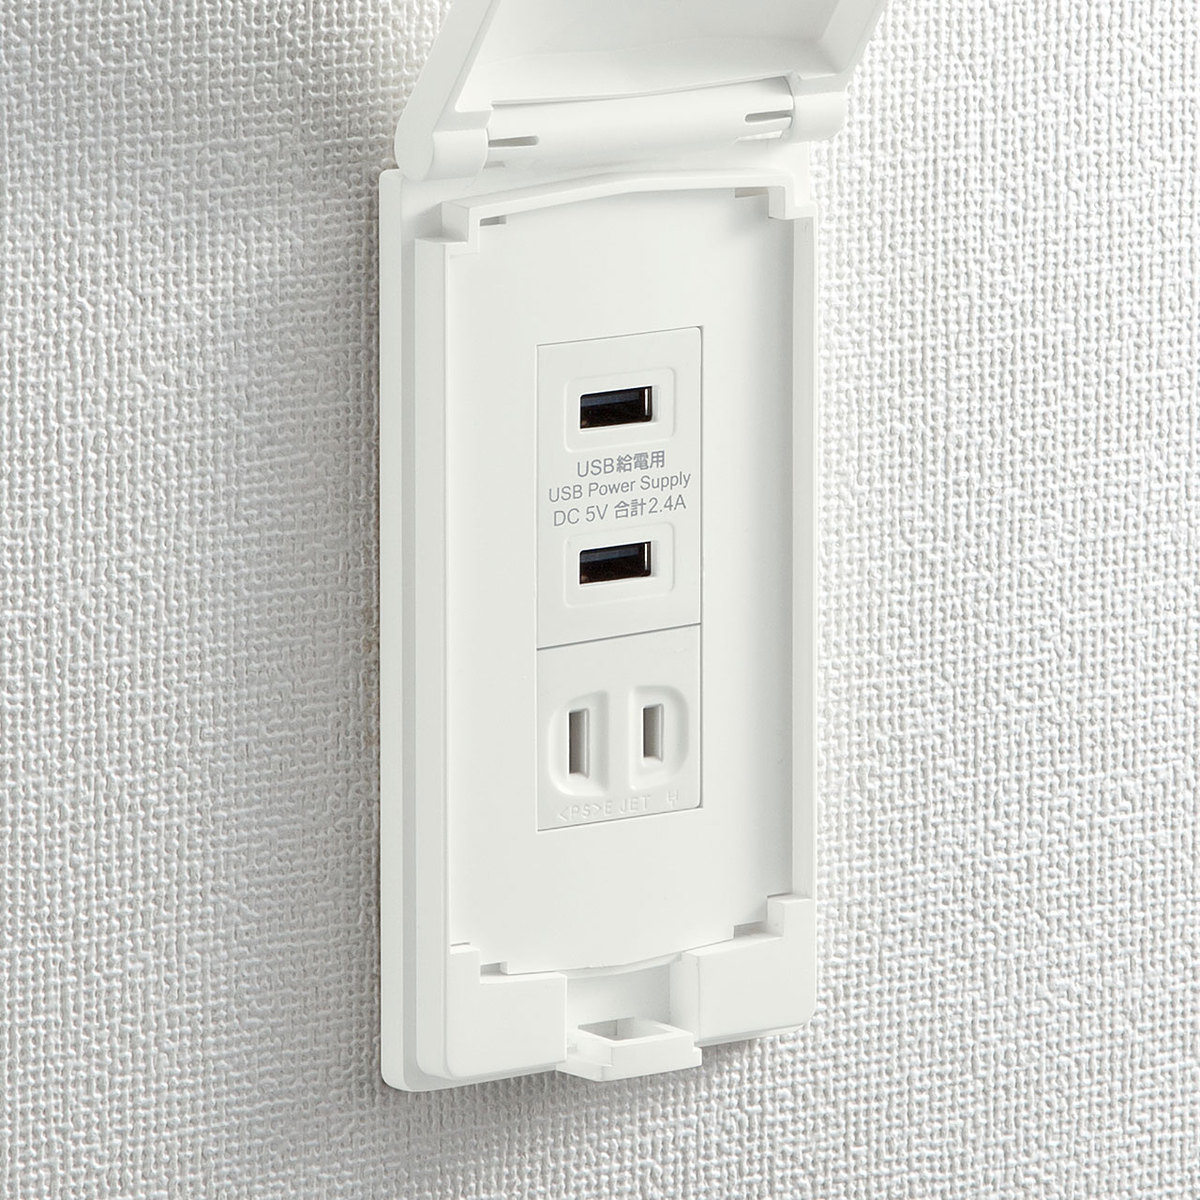 [TAP-KJUSB2W] 埋込USB給電用コンセント